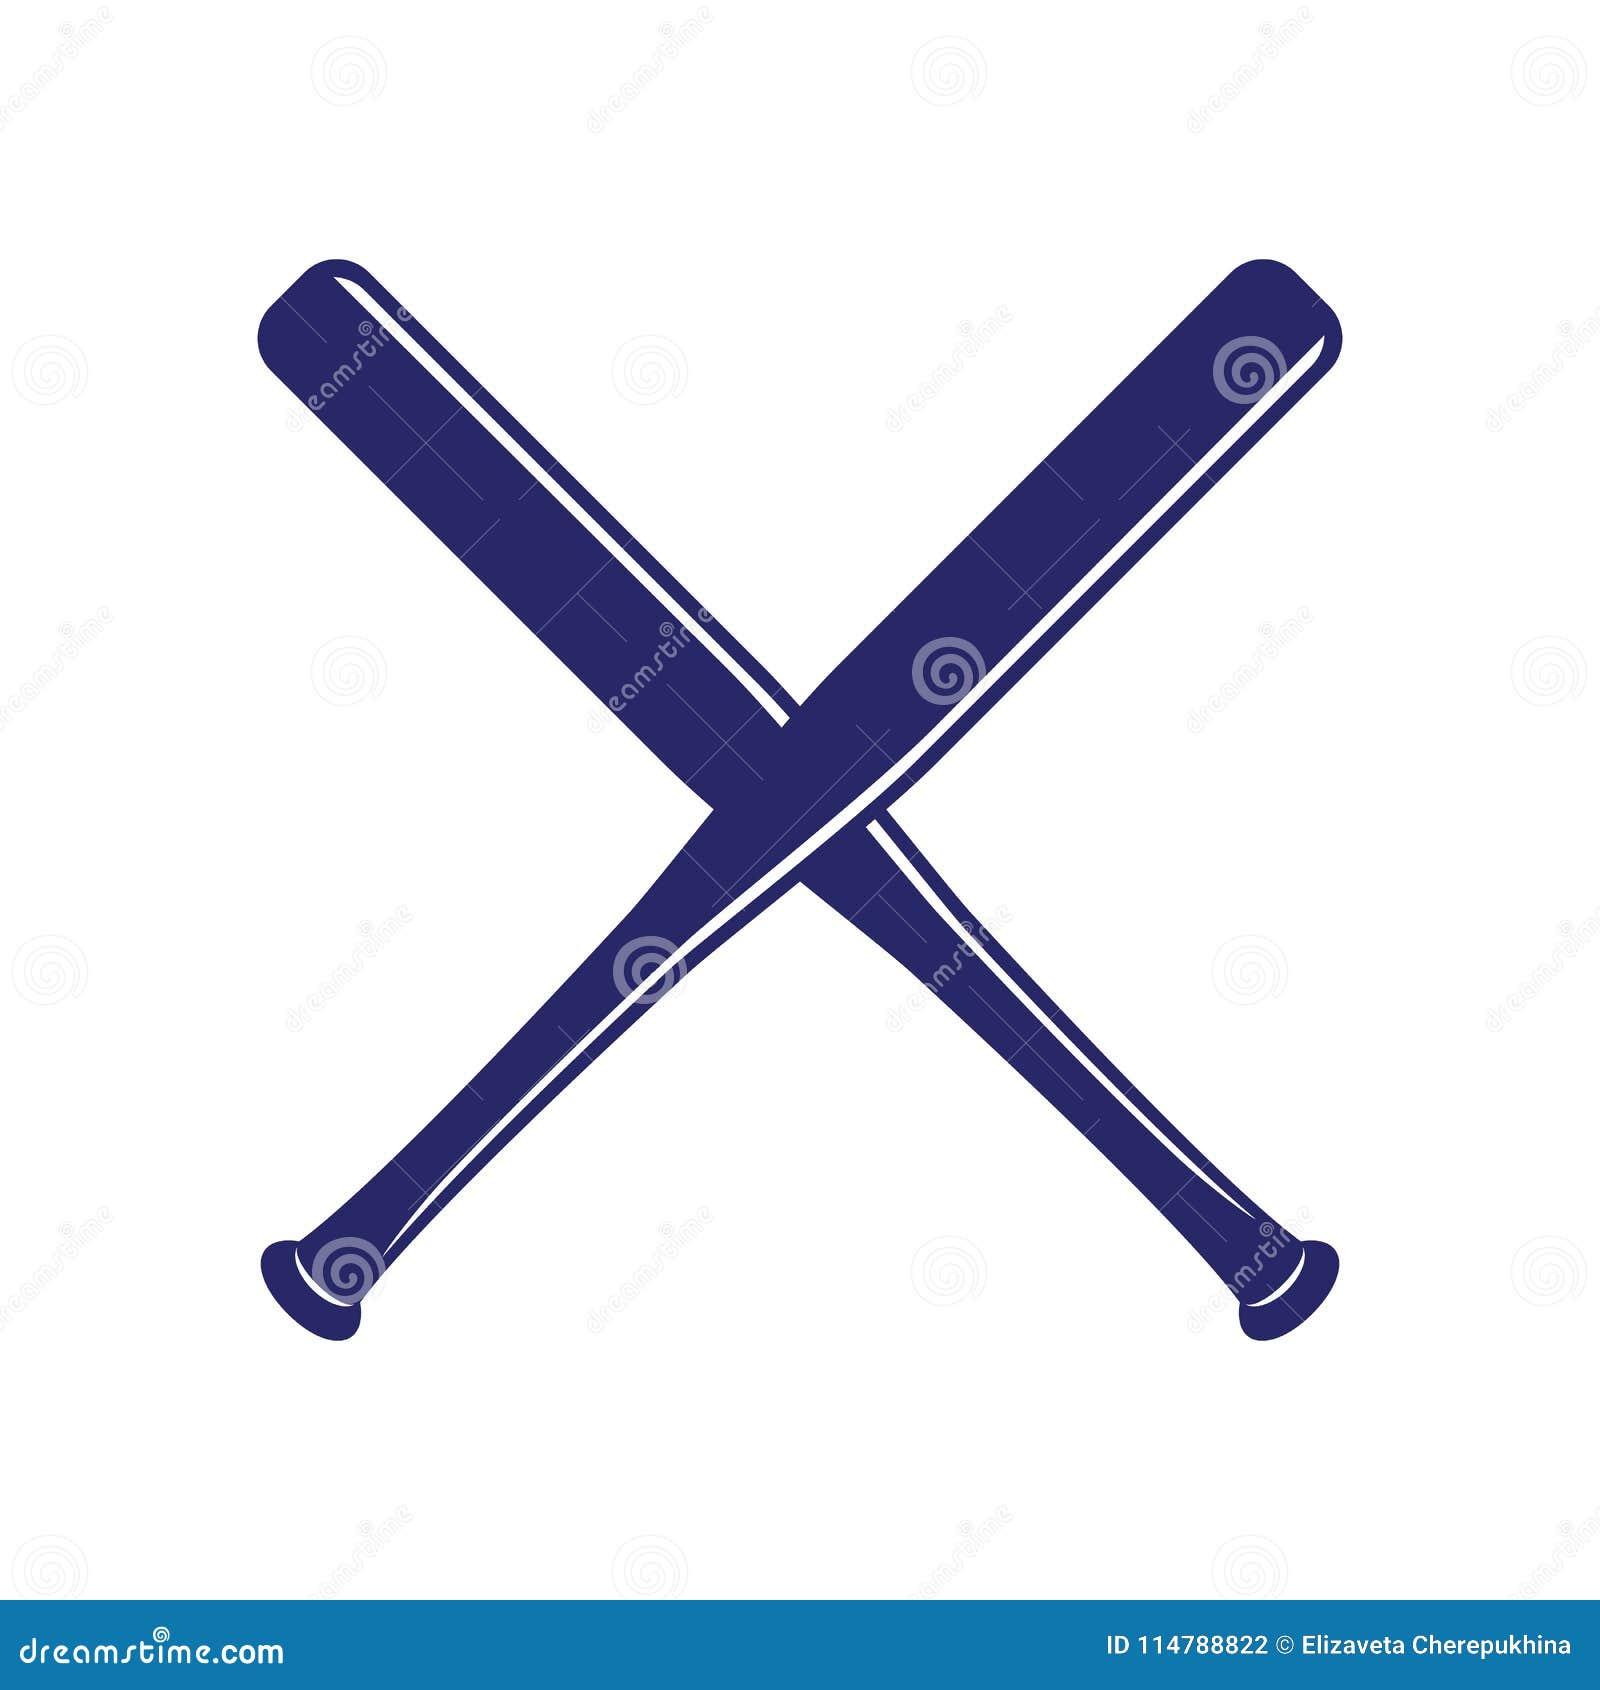 a8f0d564b1c Baseball crossed bats. Criss cross bats. Baseball flat vector illustration